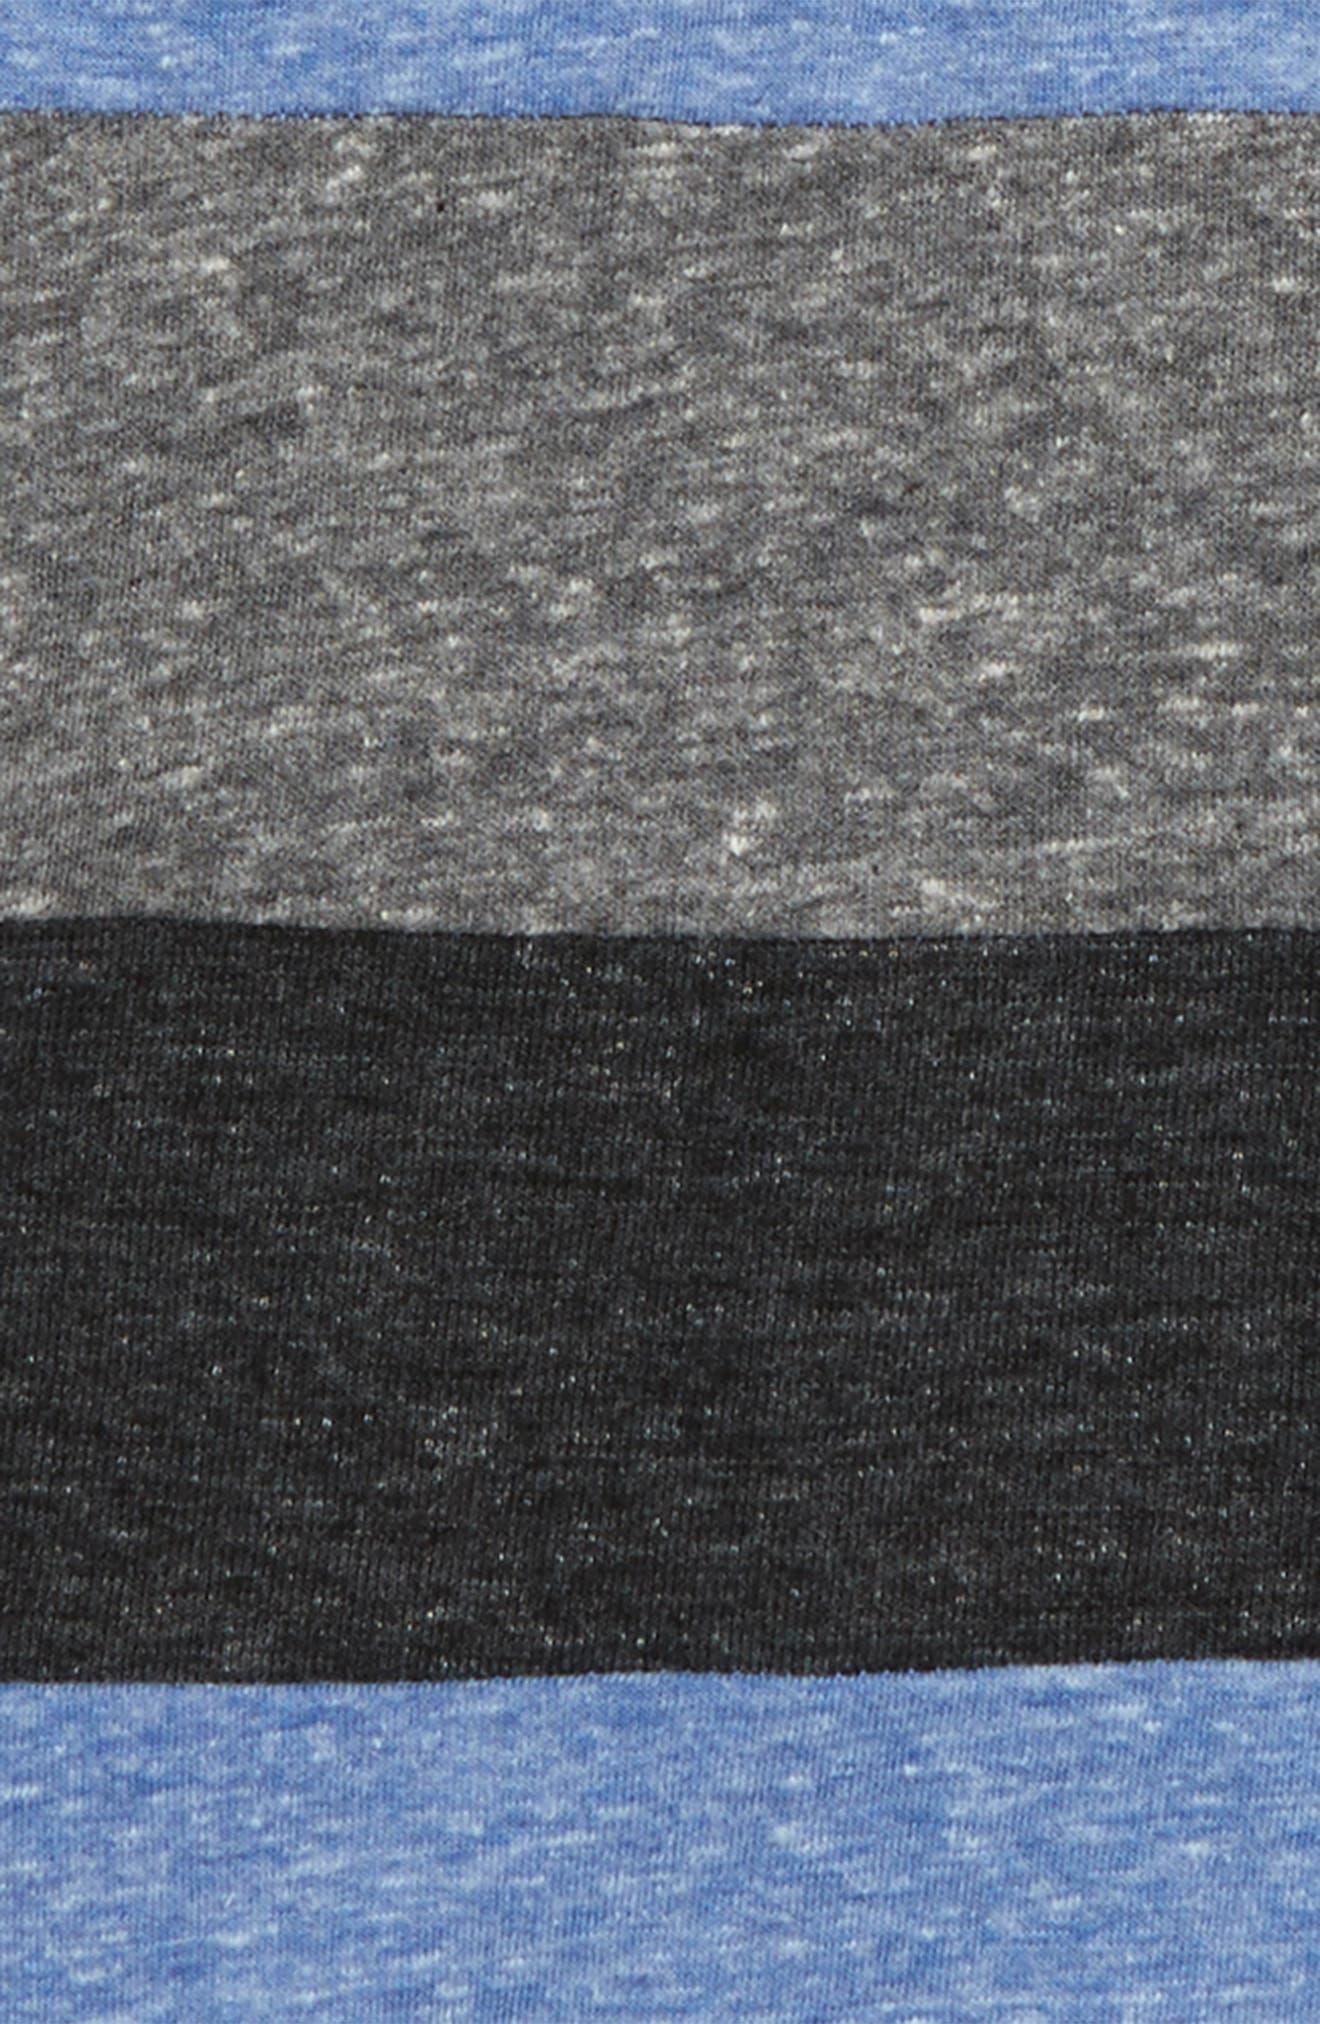 Dax T-Shirt,                             Alternate thumbnail 2, color,                             400